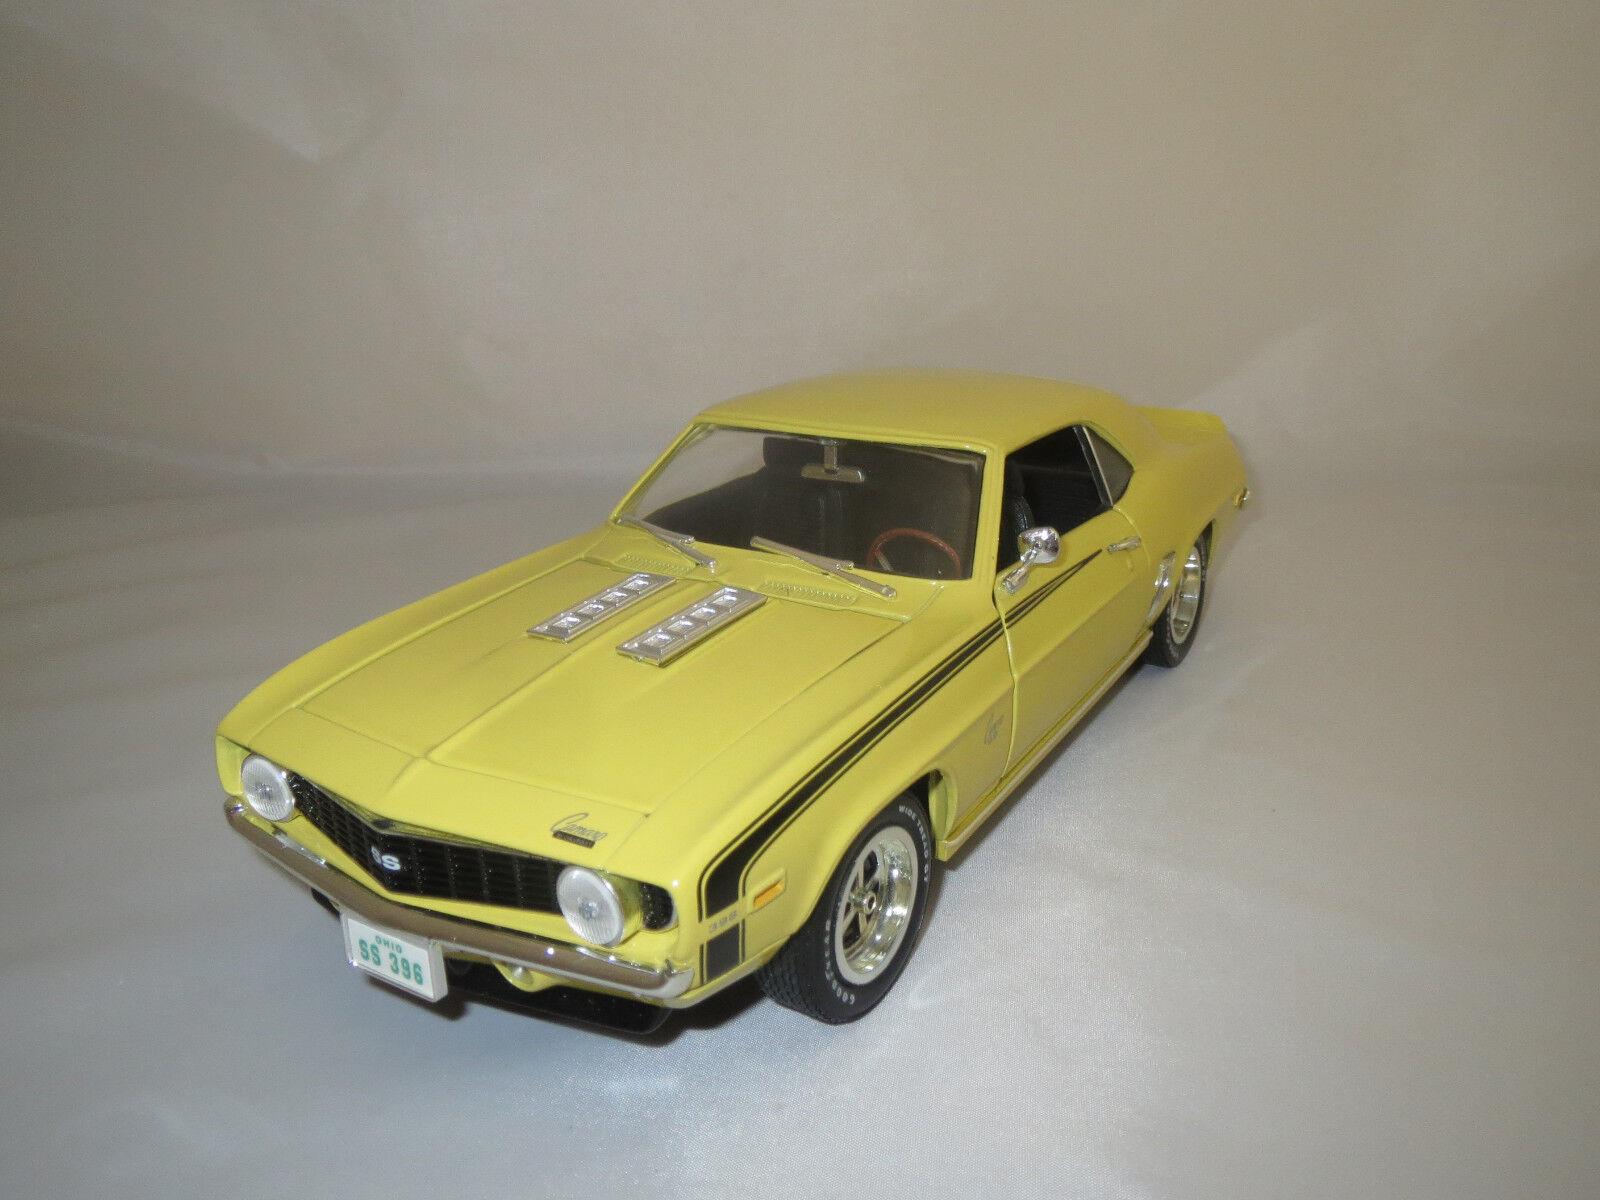 ERTL American Muscle CHEVROLET CAMARO ss (1969)  jaune  1 18 sans emballage